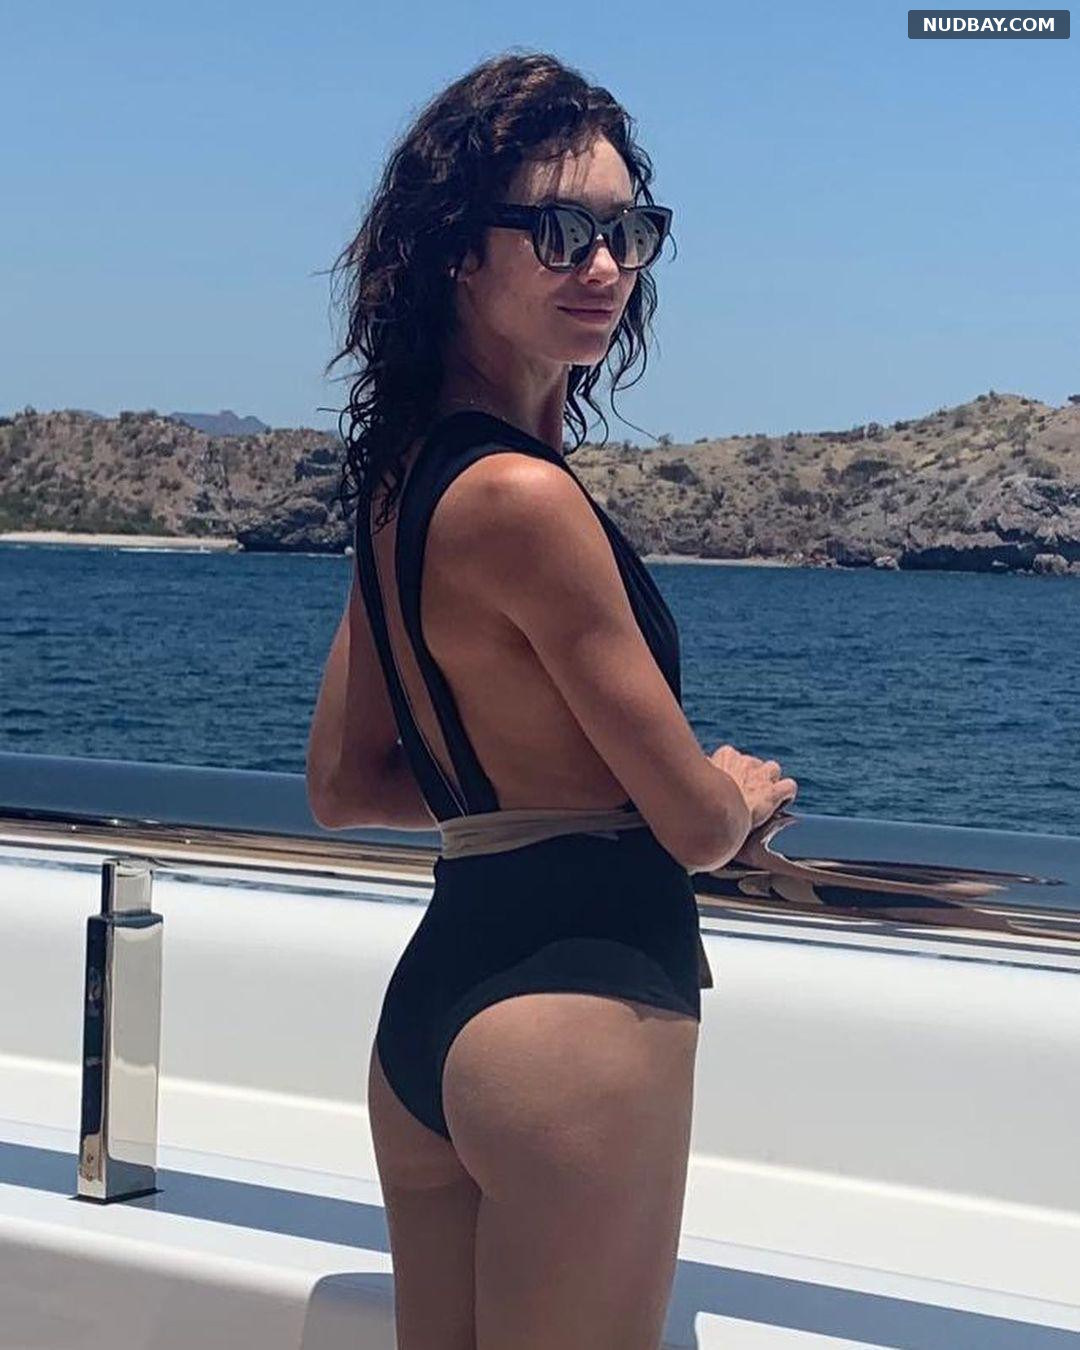 Olga Kurylenko bikini Jun 27 2020